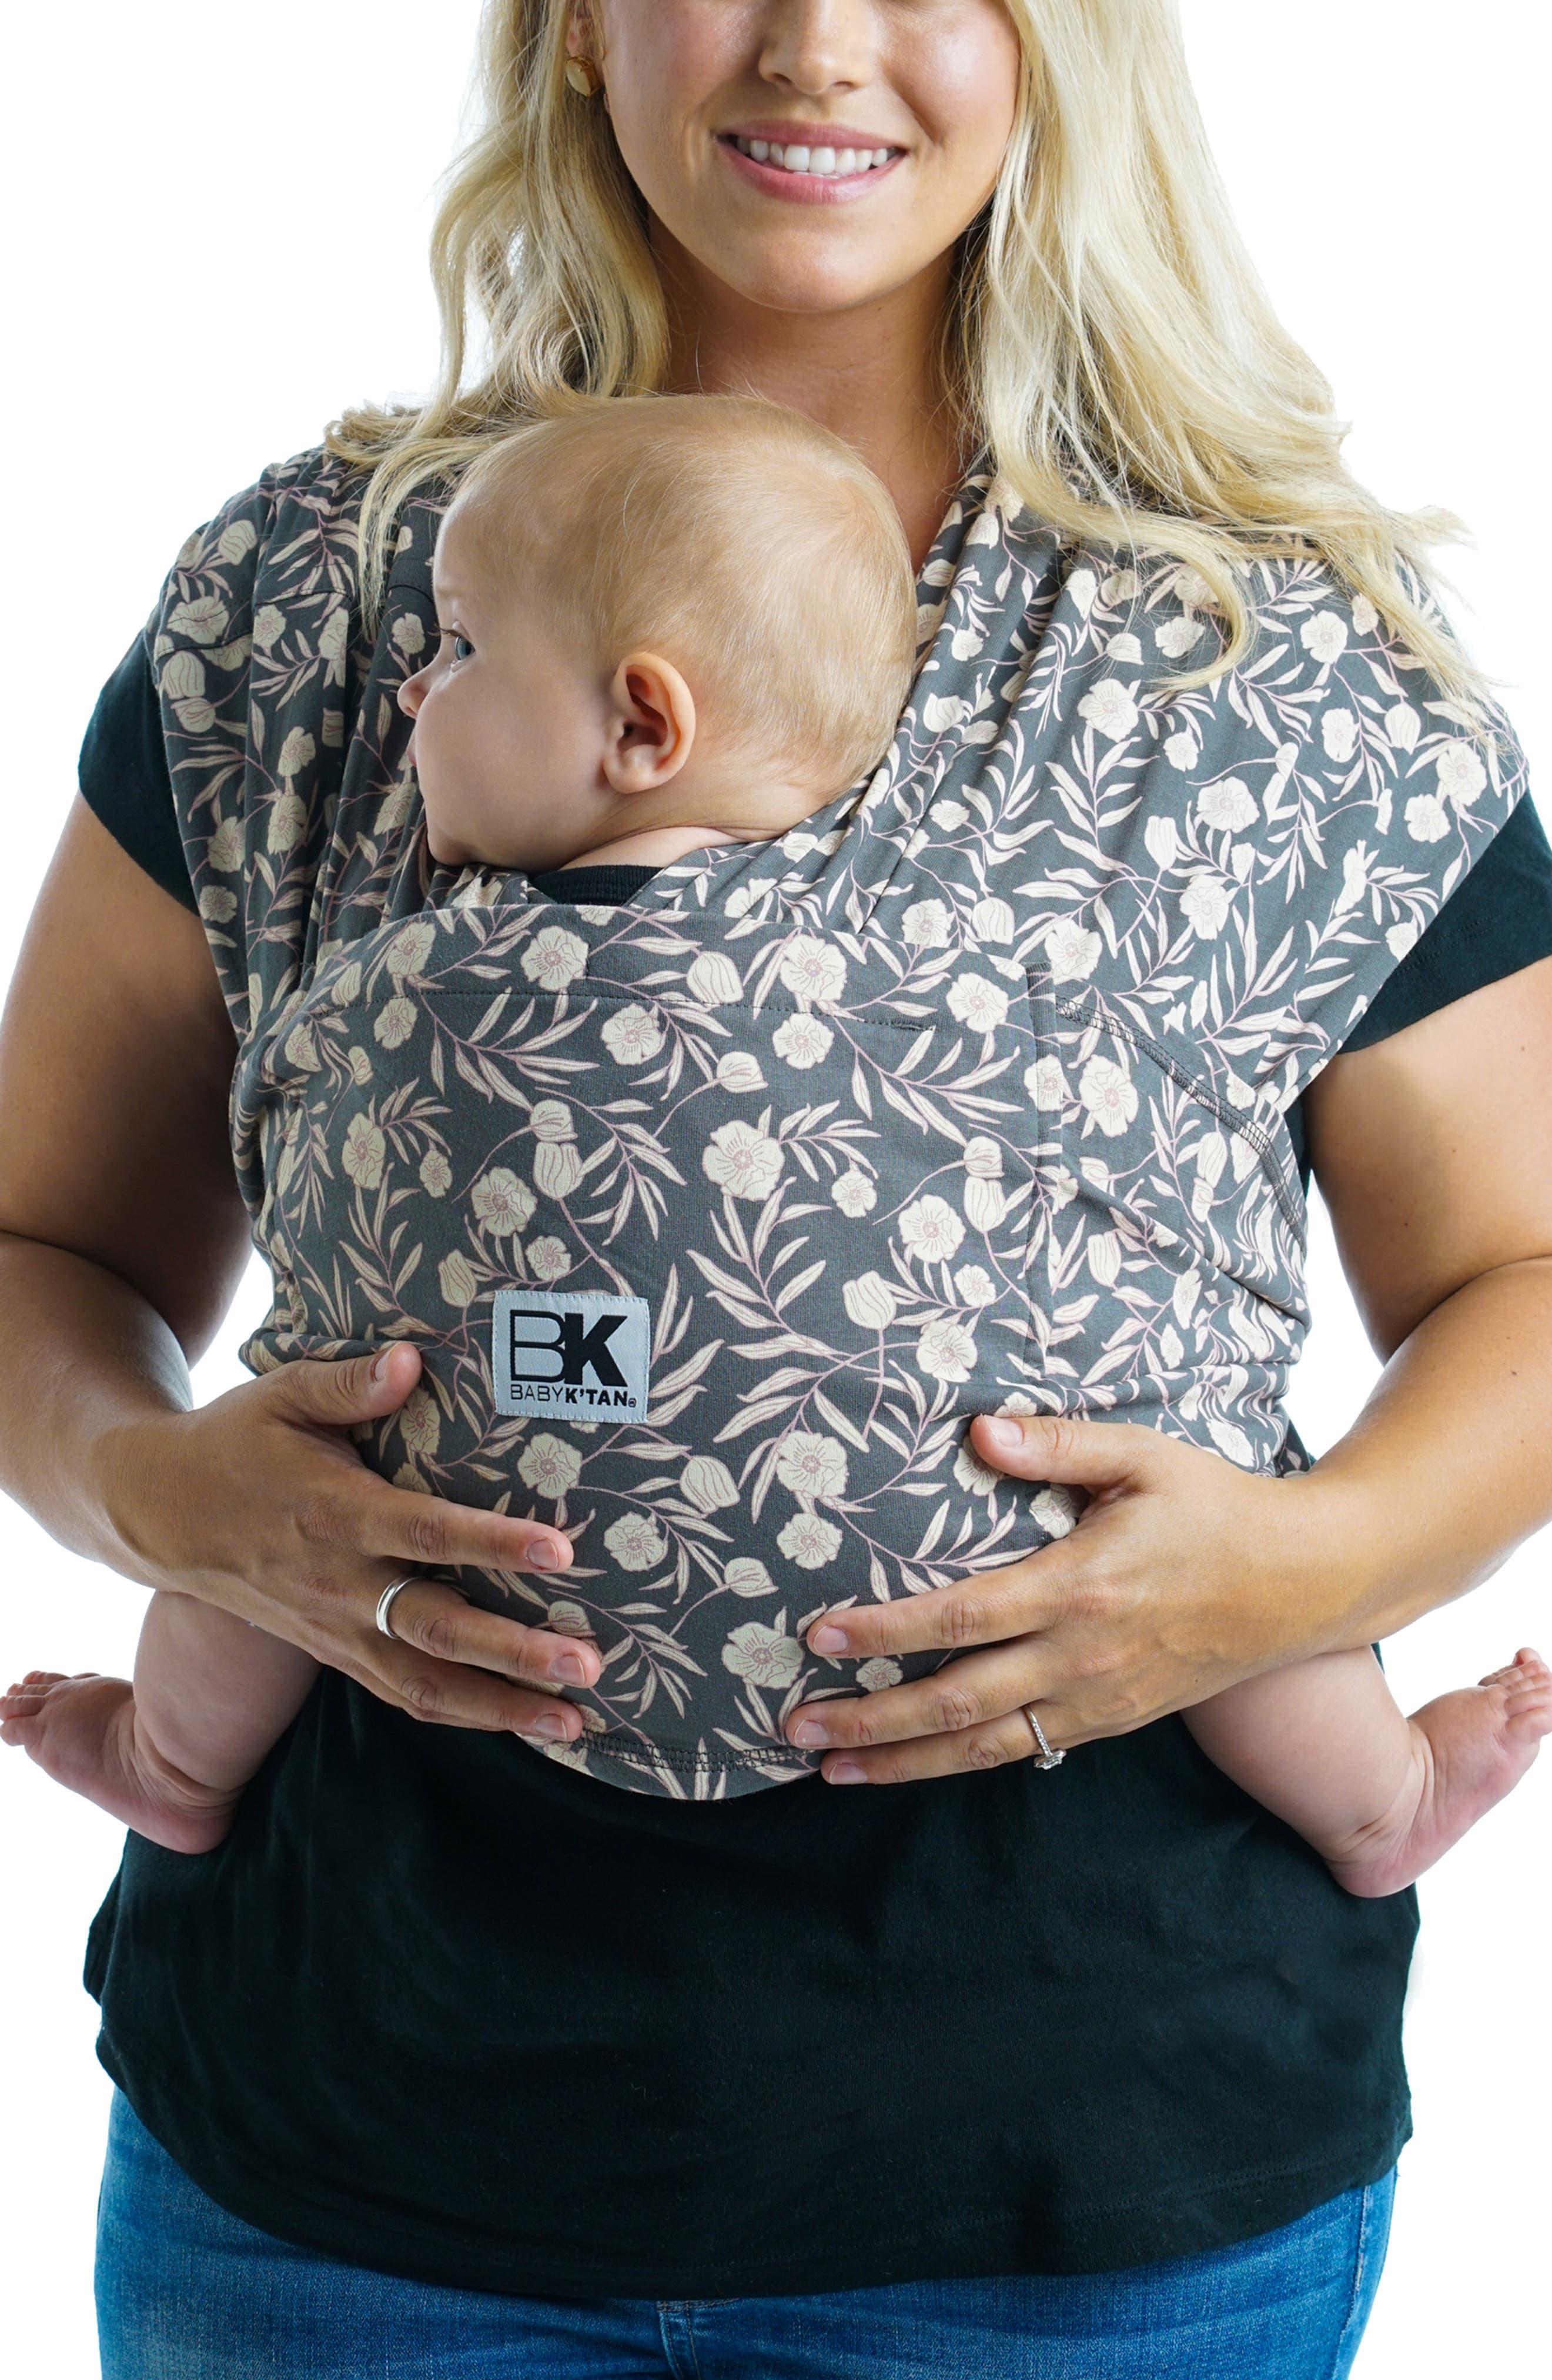 Baby K'Tan Infant Baby K'Tan Original Floral Garden Baby Carrier, Size Large - Grey